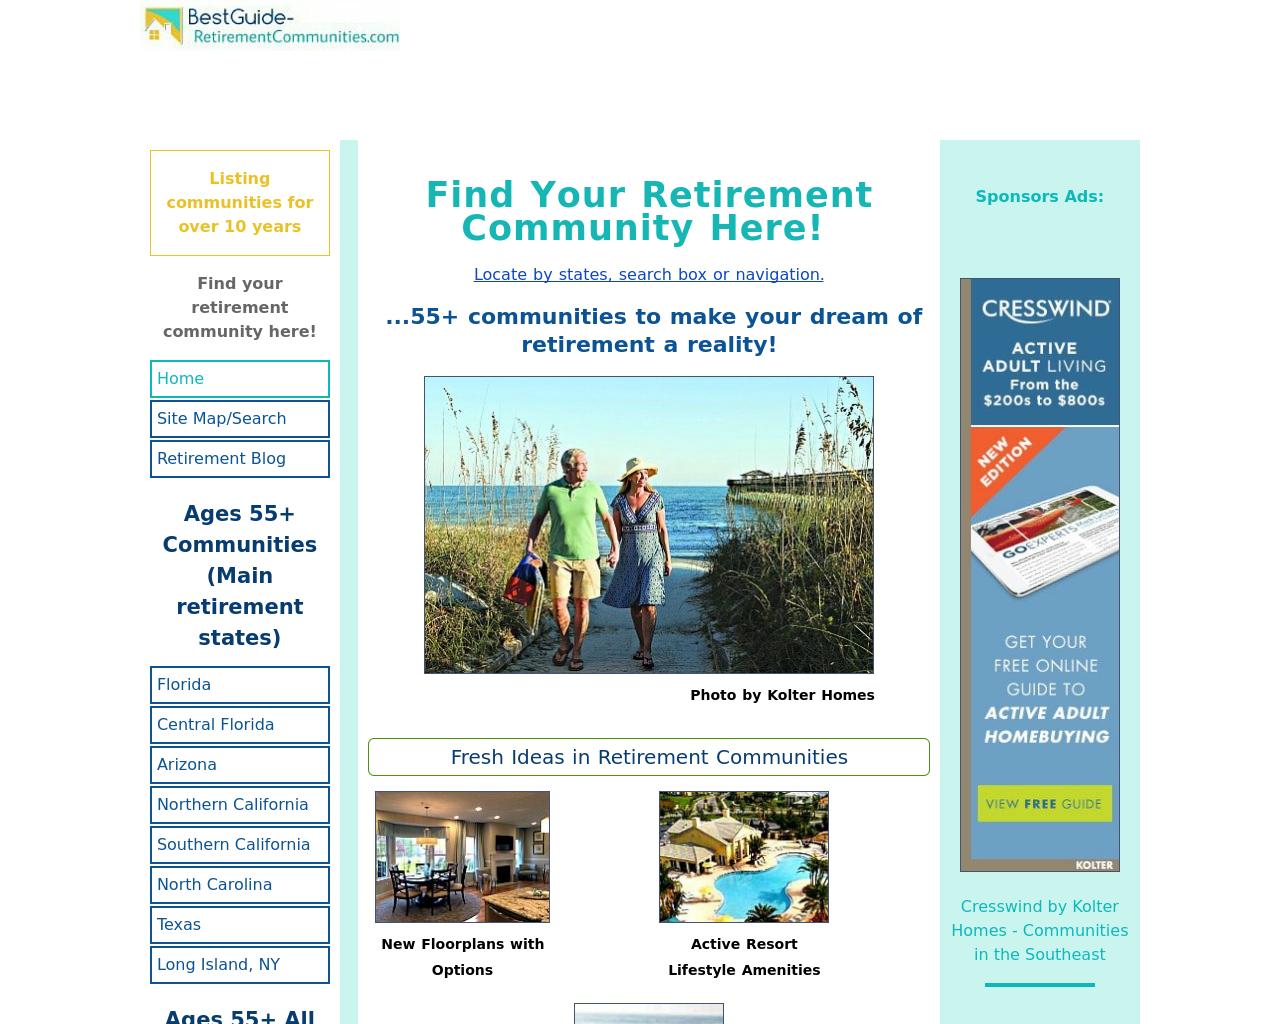 Bestguide-retirementcommunities.com-Advertising-Reviews-Pricing